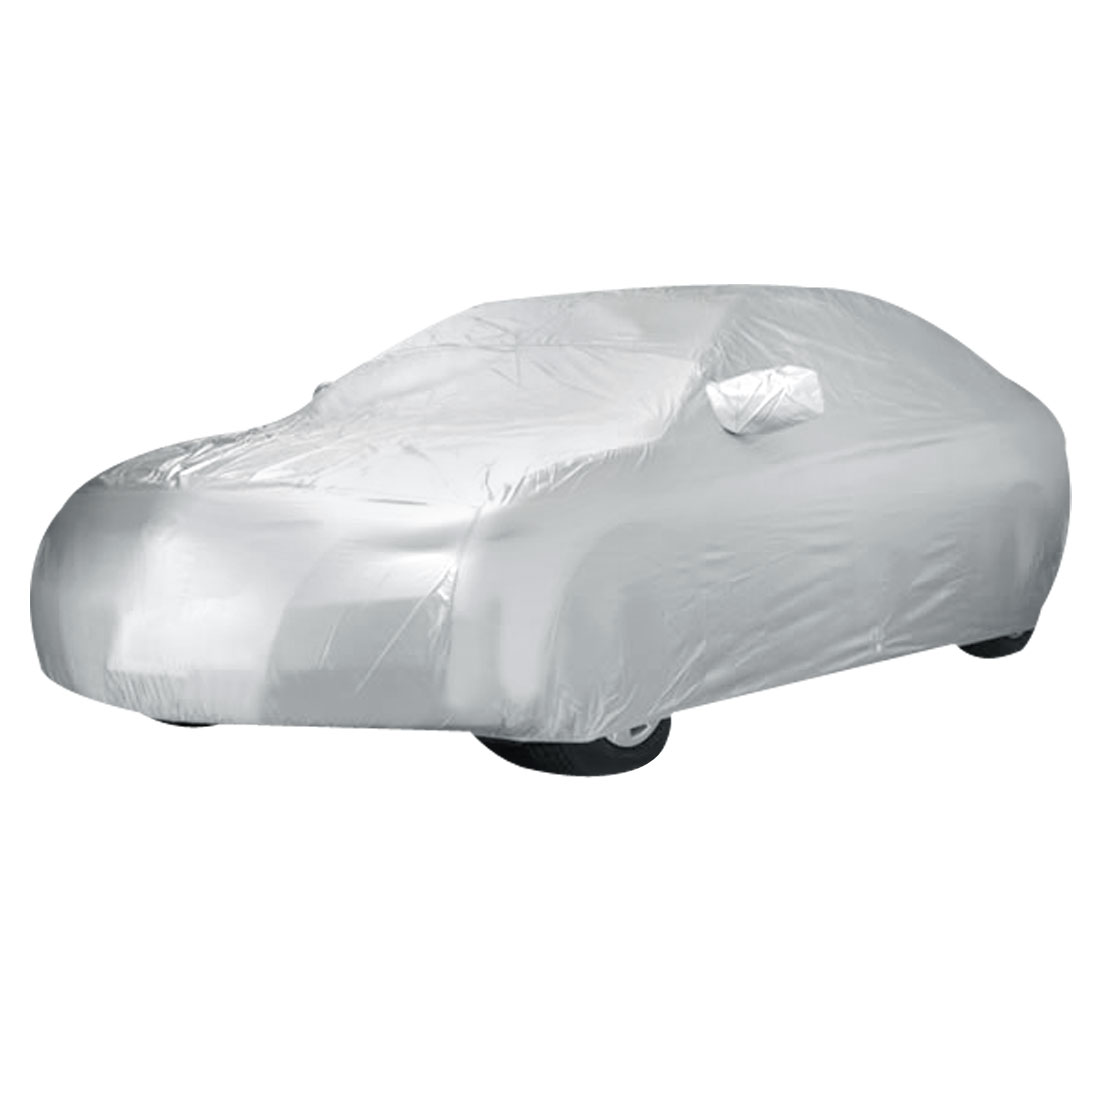 Outdoor Anti Dust Rain Snow Waterproof Gray Saloon Sedan Car Cover Size XXL 5350*2000*1600 (L*W*H)